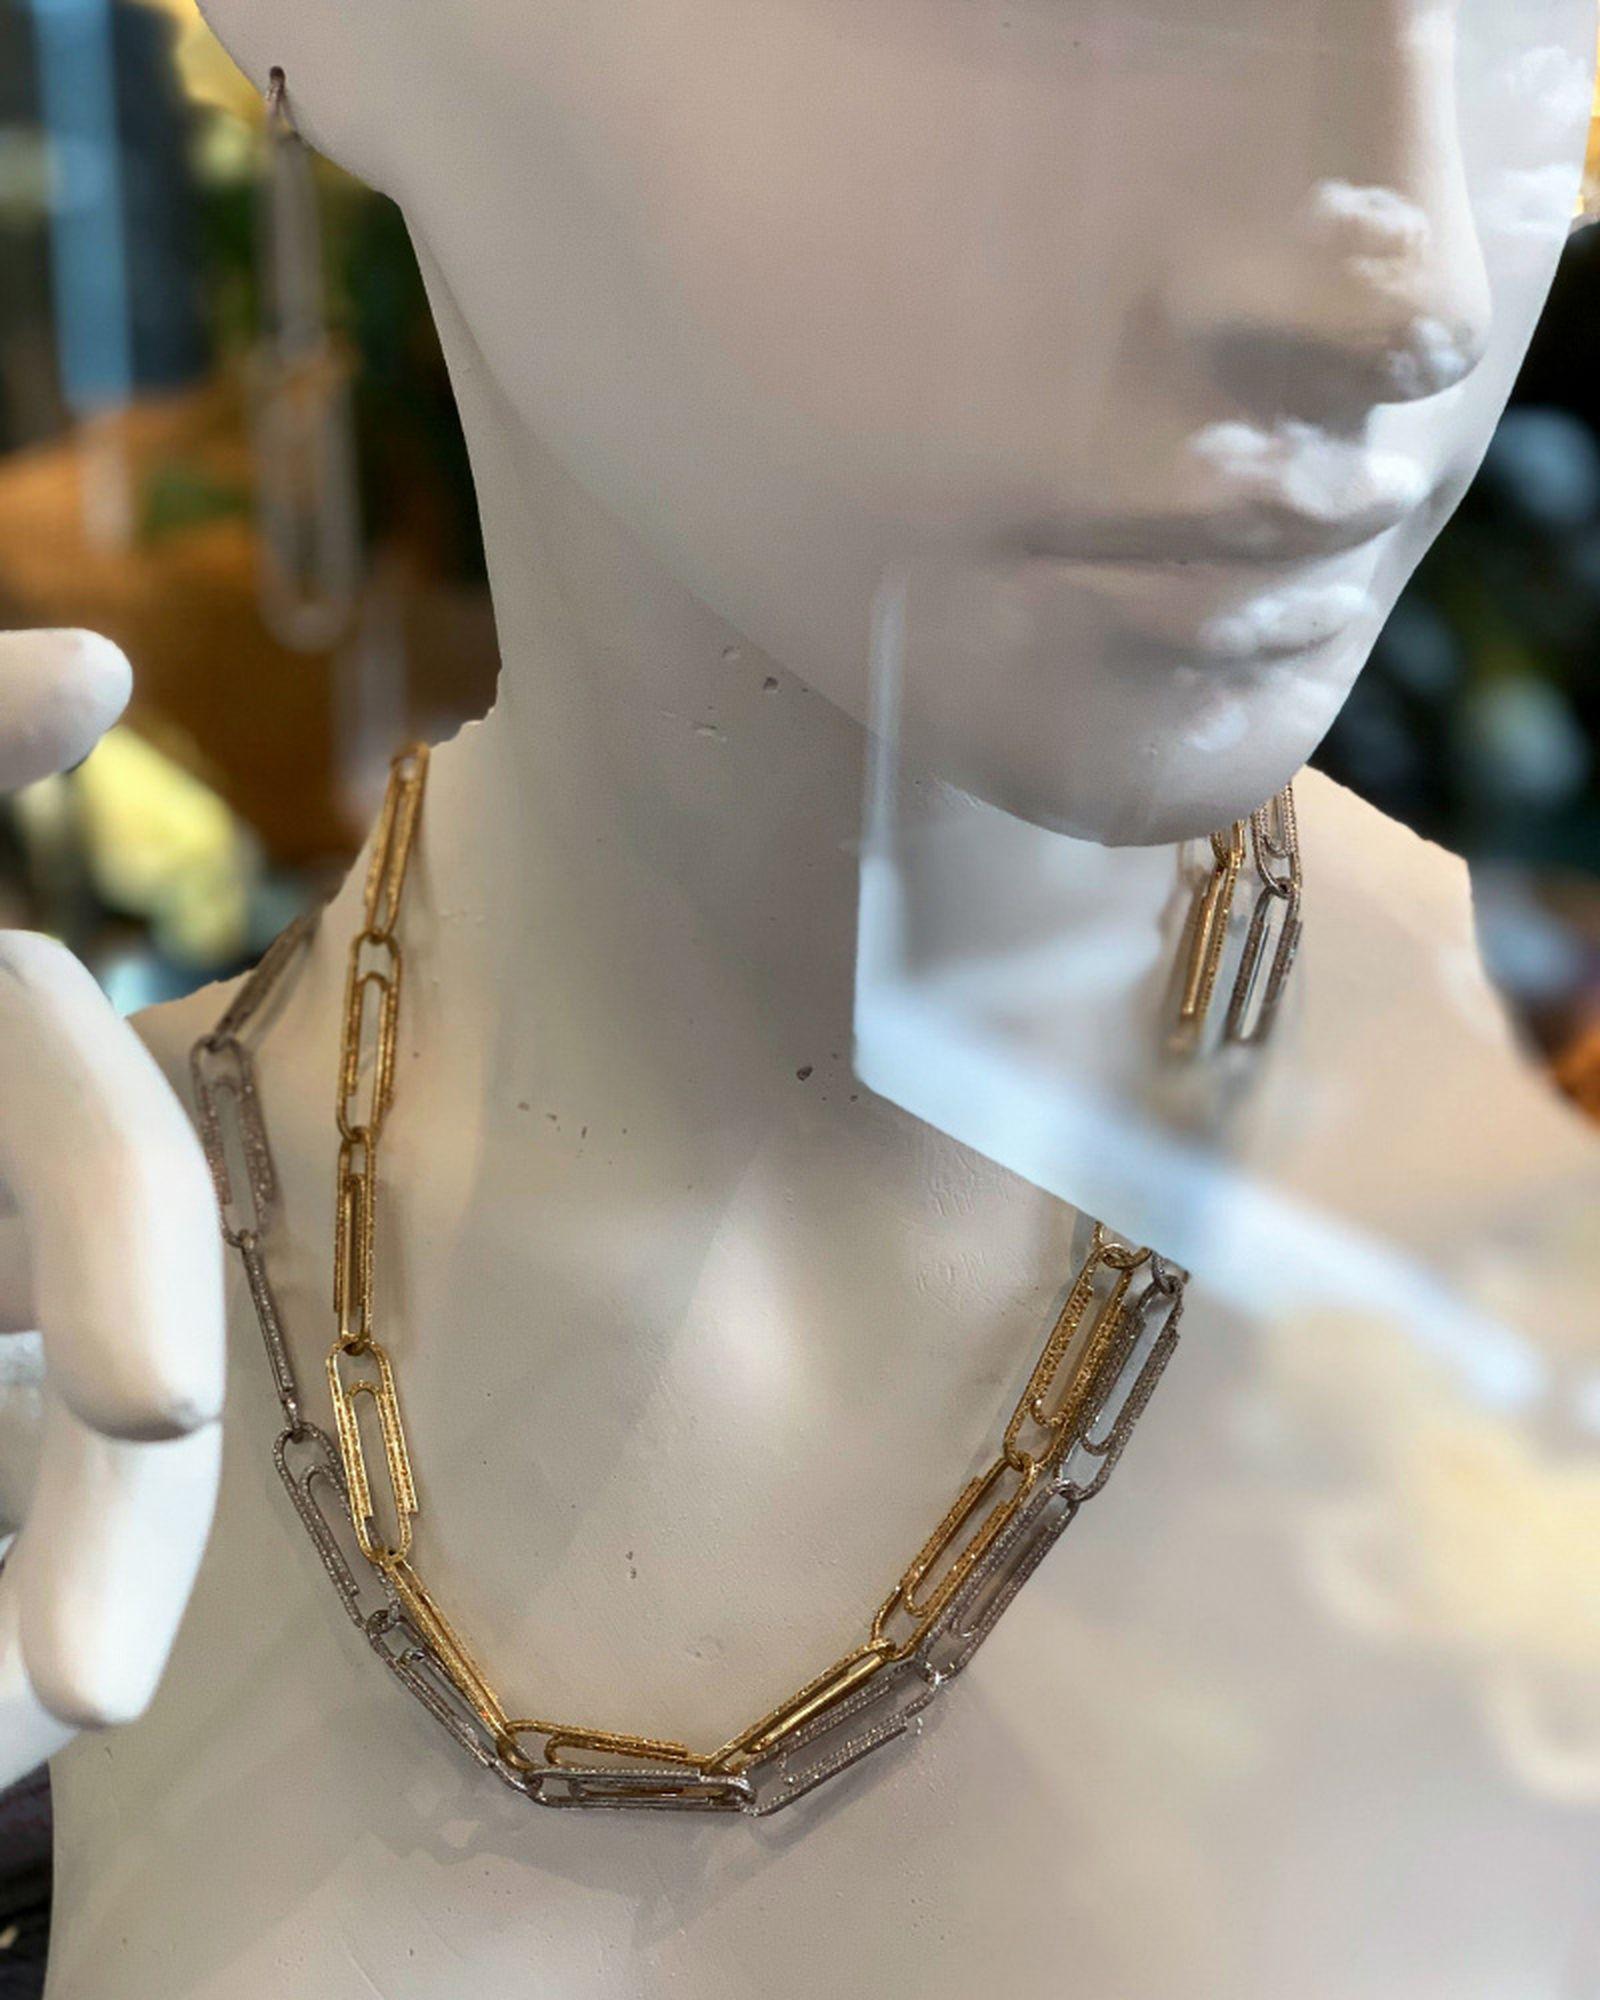 virgil abloh jewelry line OFF-WHITE c/o Virgil Abloh PW19 pfw19